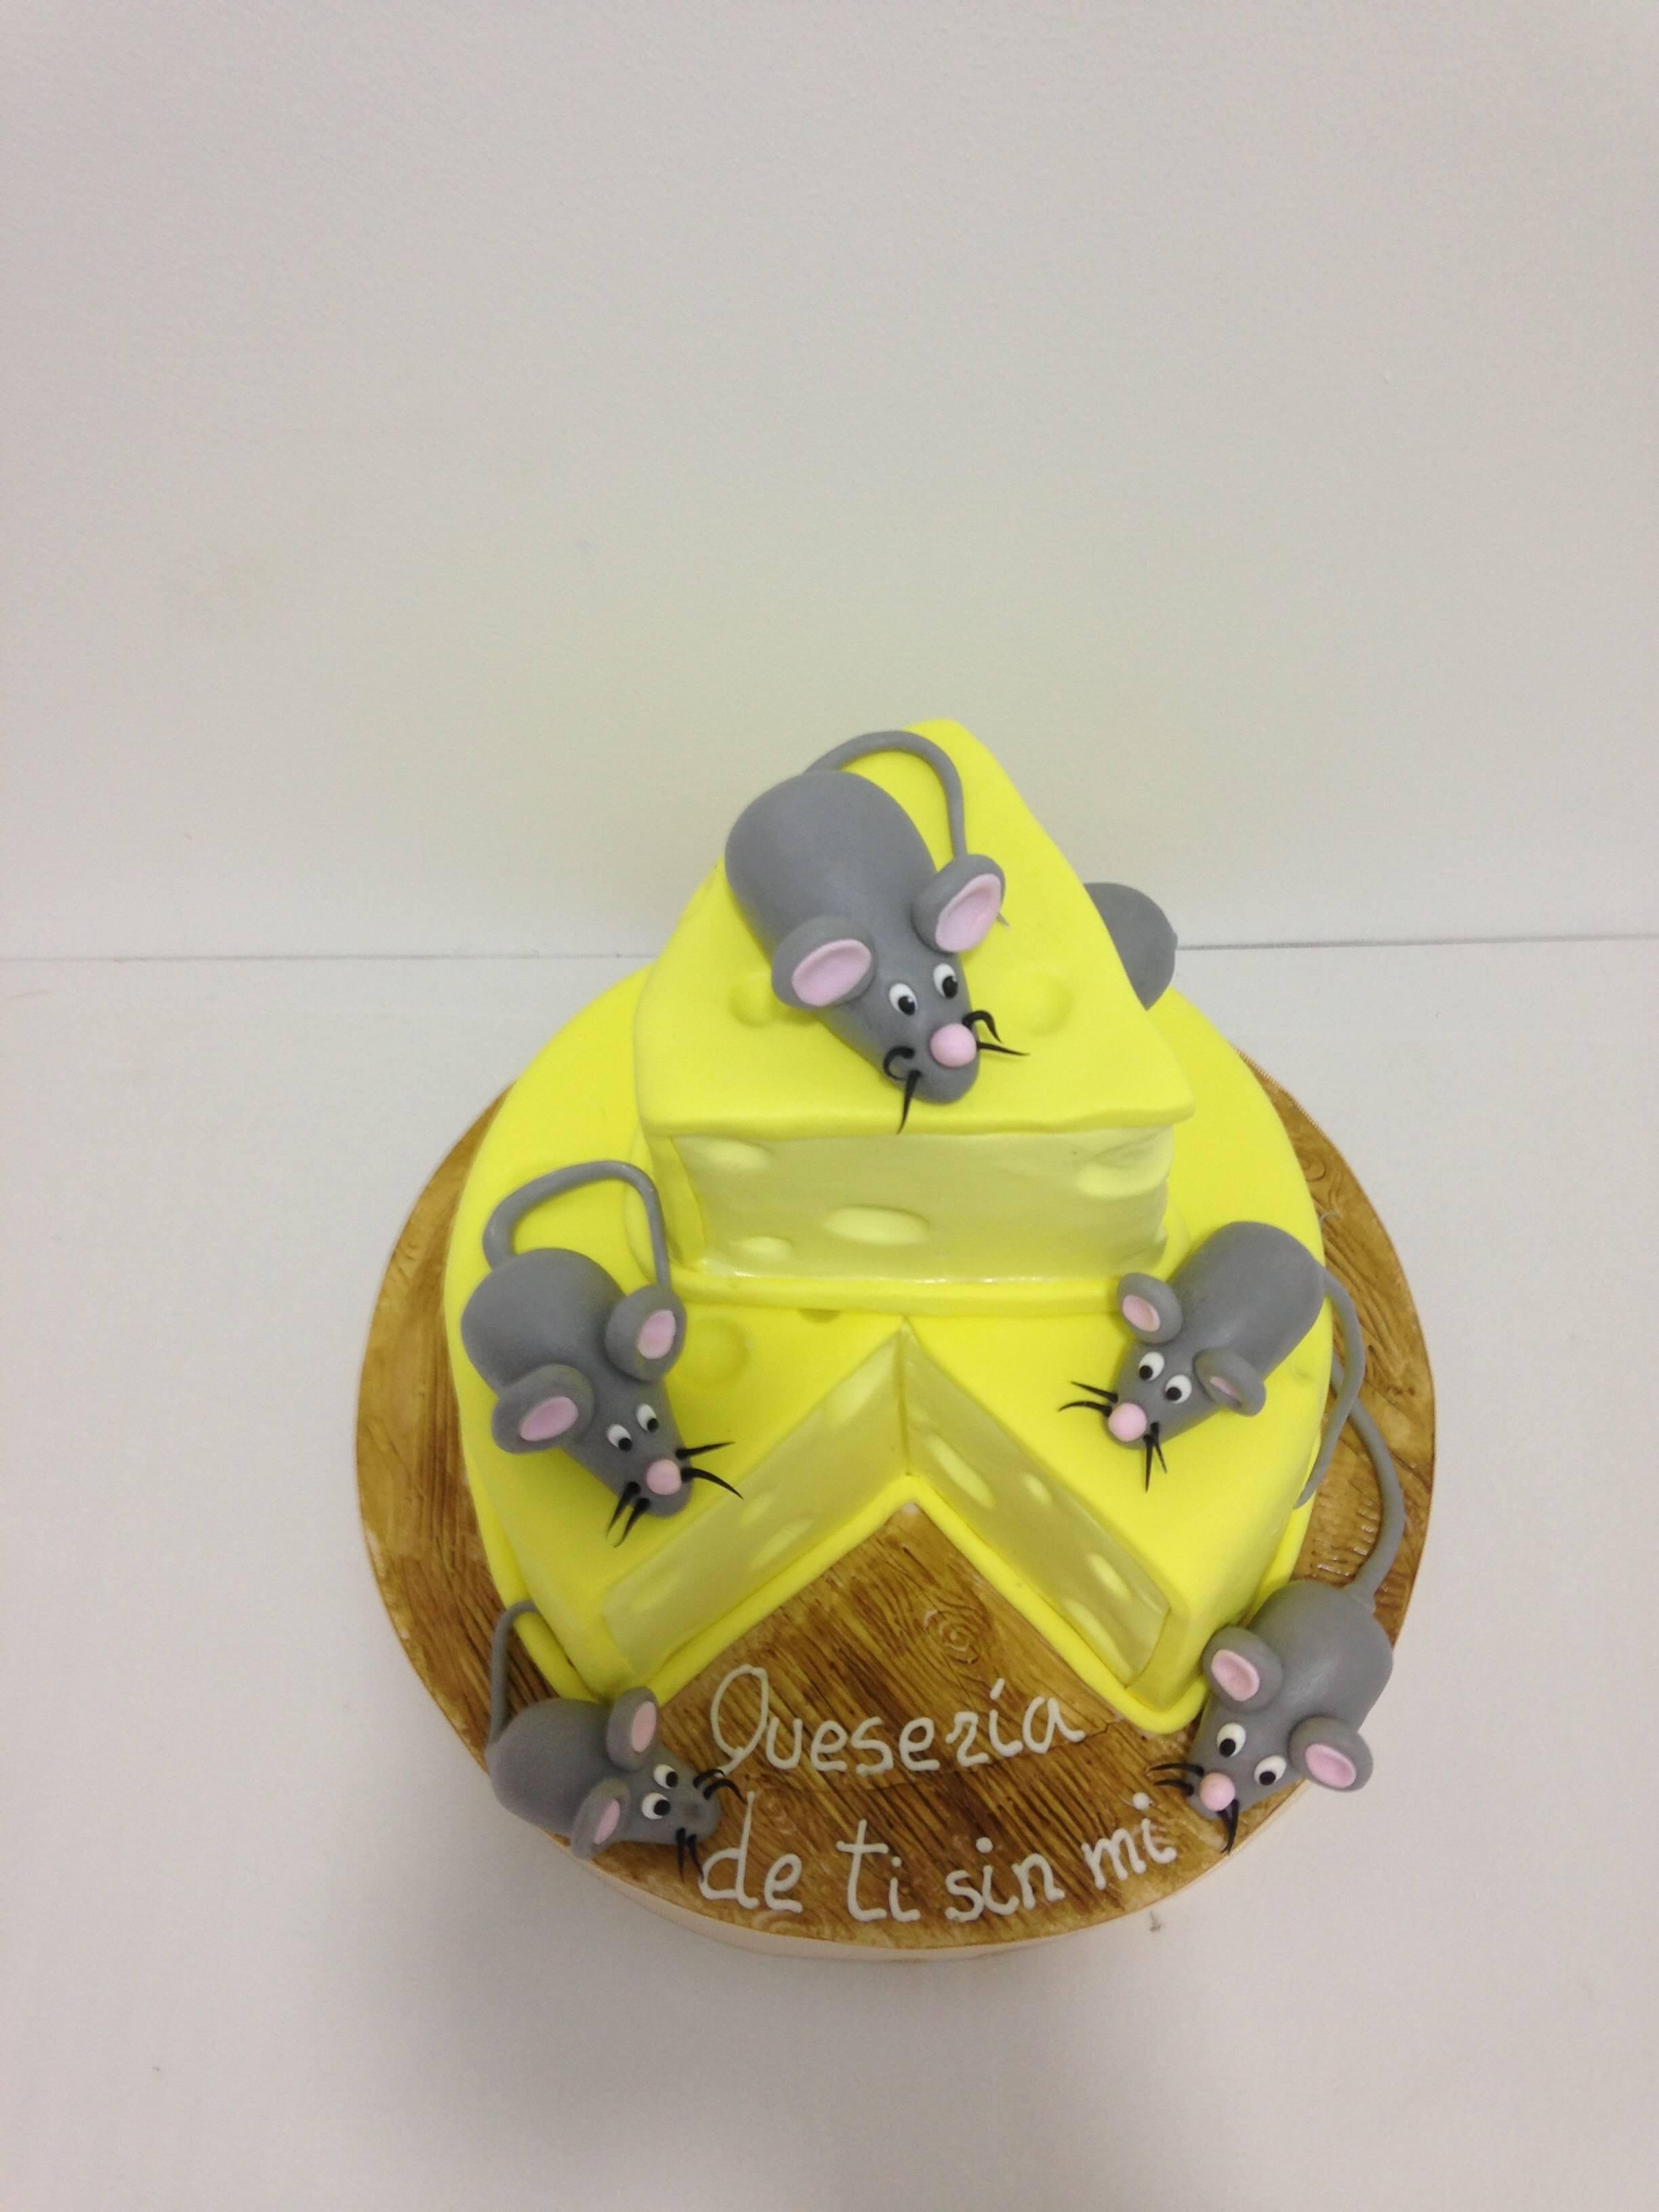 Tarta cumpleaños queso quesería ratón coruña